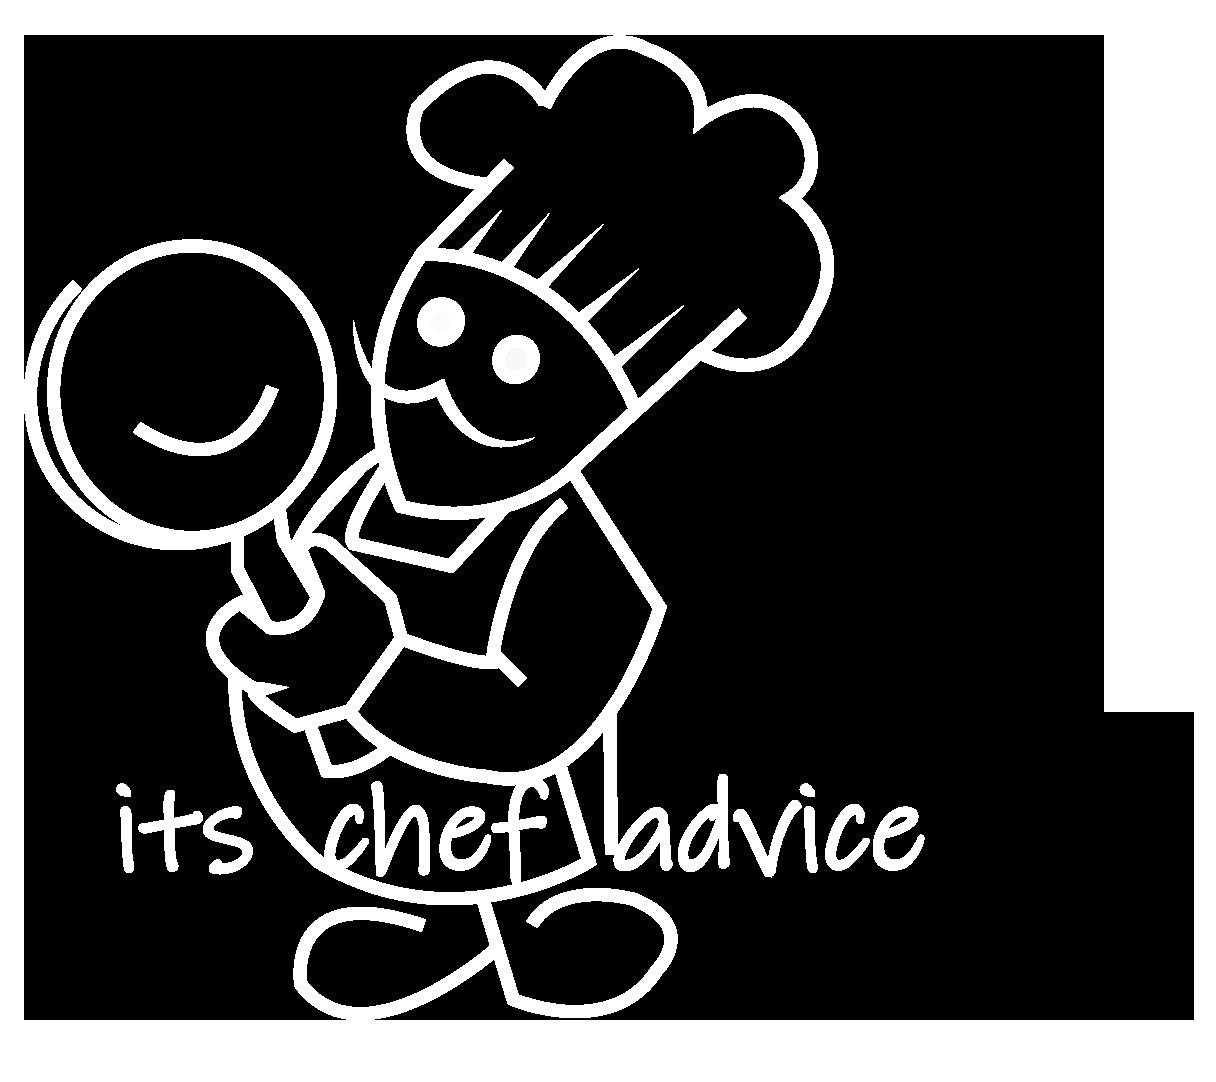 The Chef's Advice